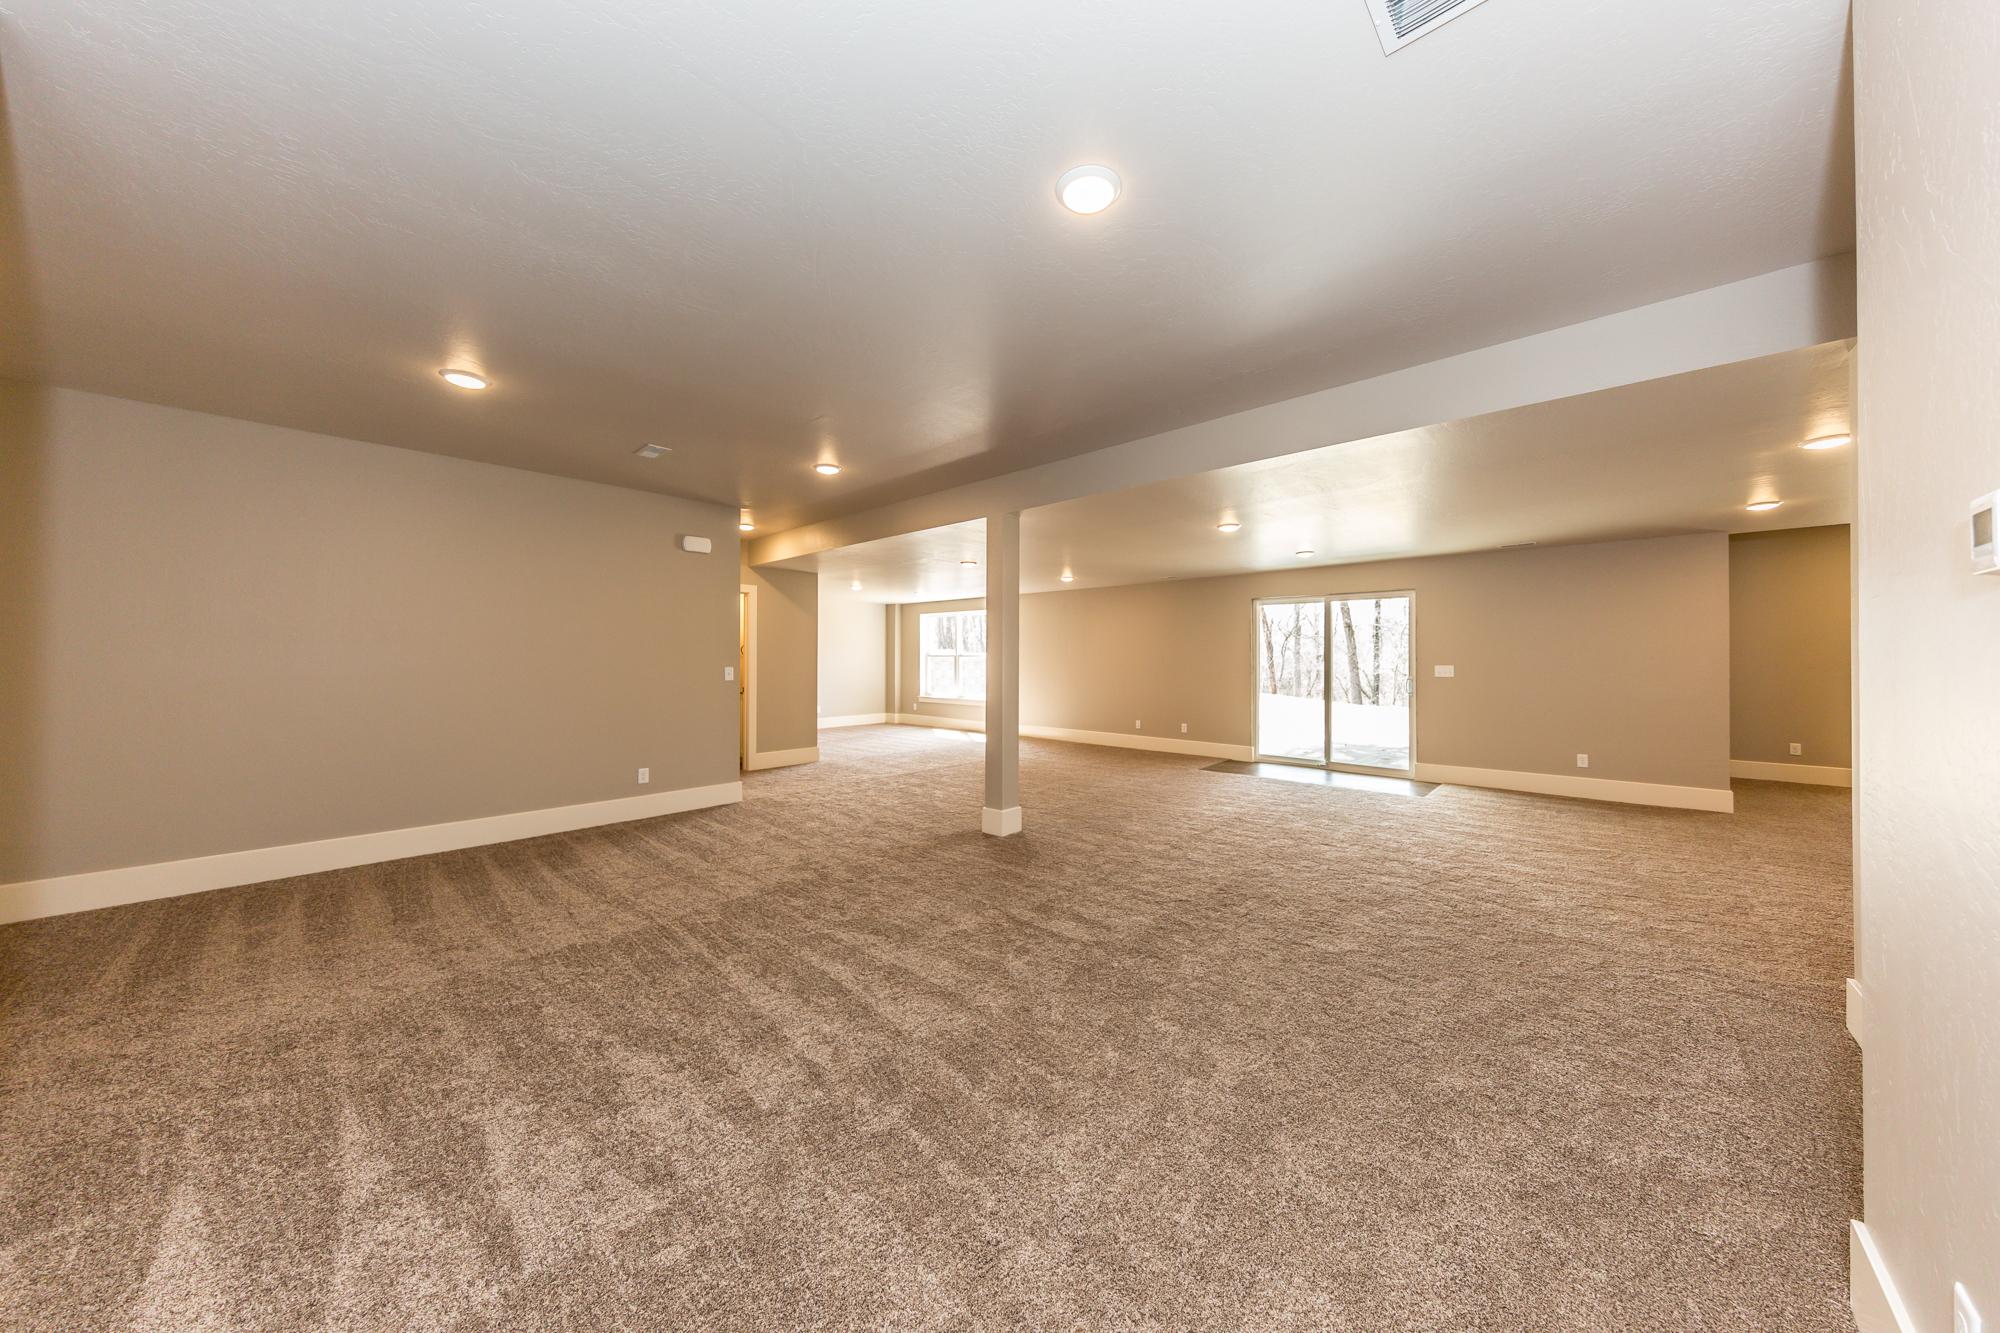 New-Construction-For-Sale-Bethel-Ridge-Farms-Scott-AFB-Illinois-31.0.jpg